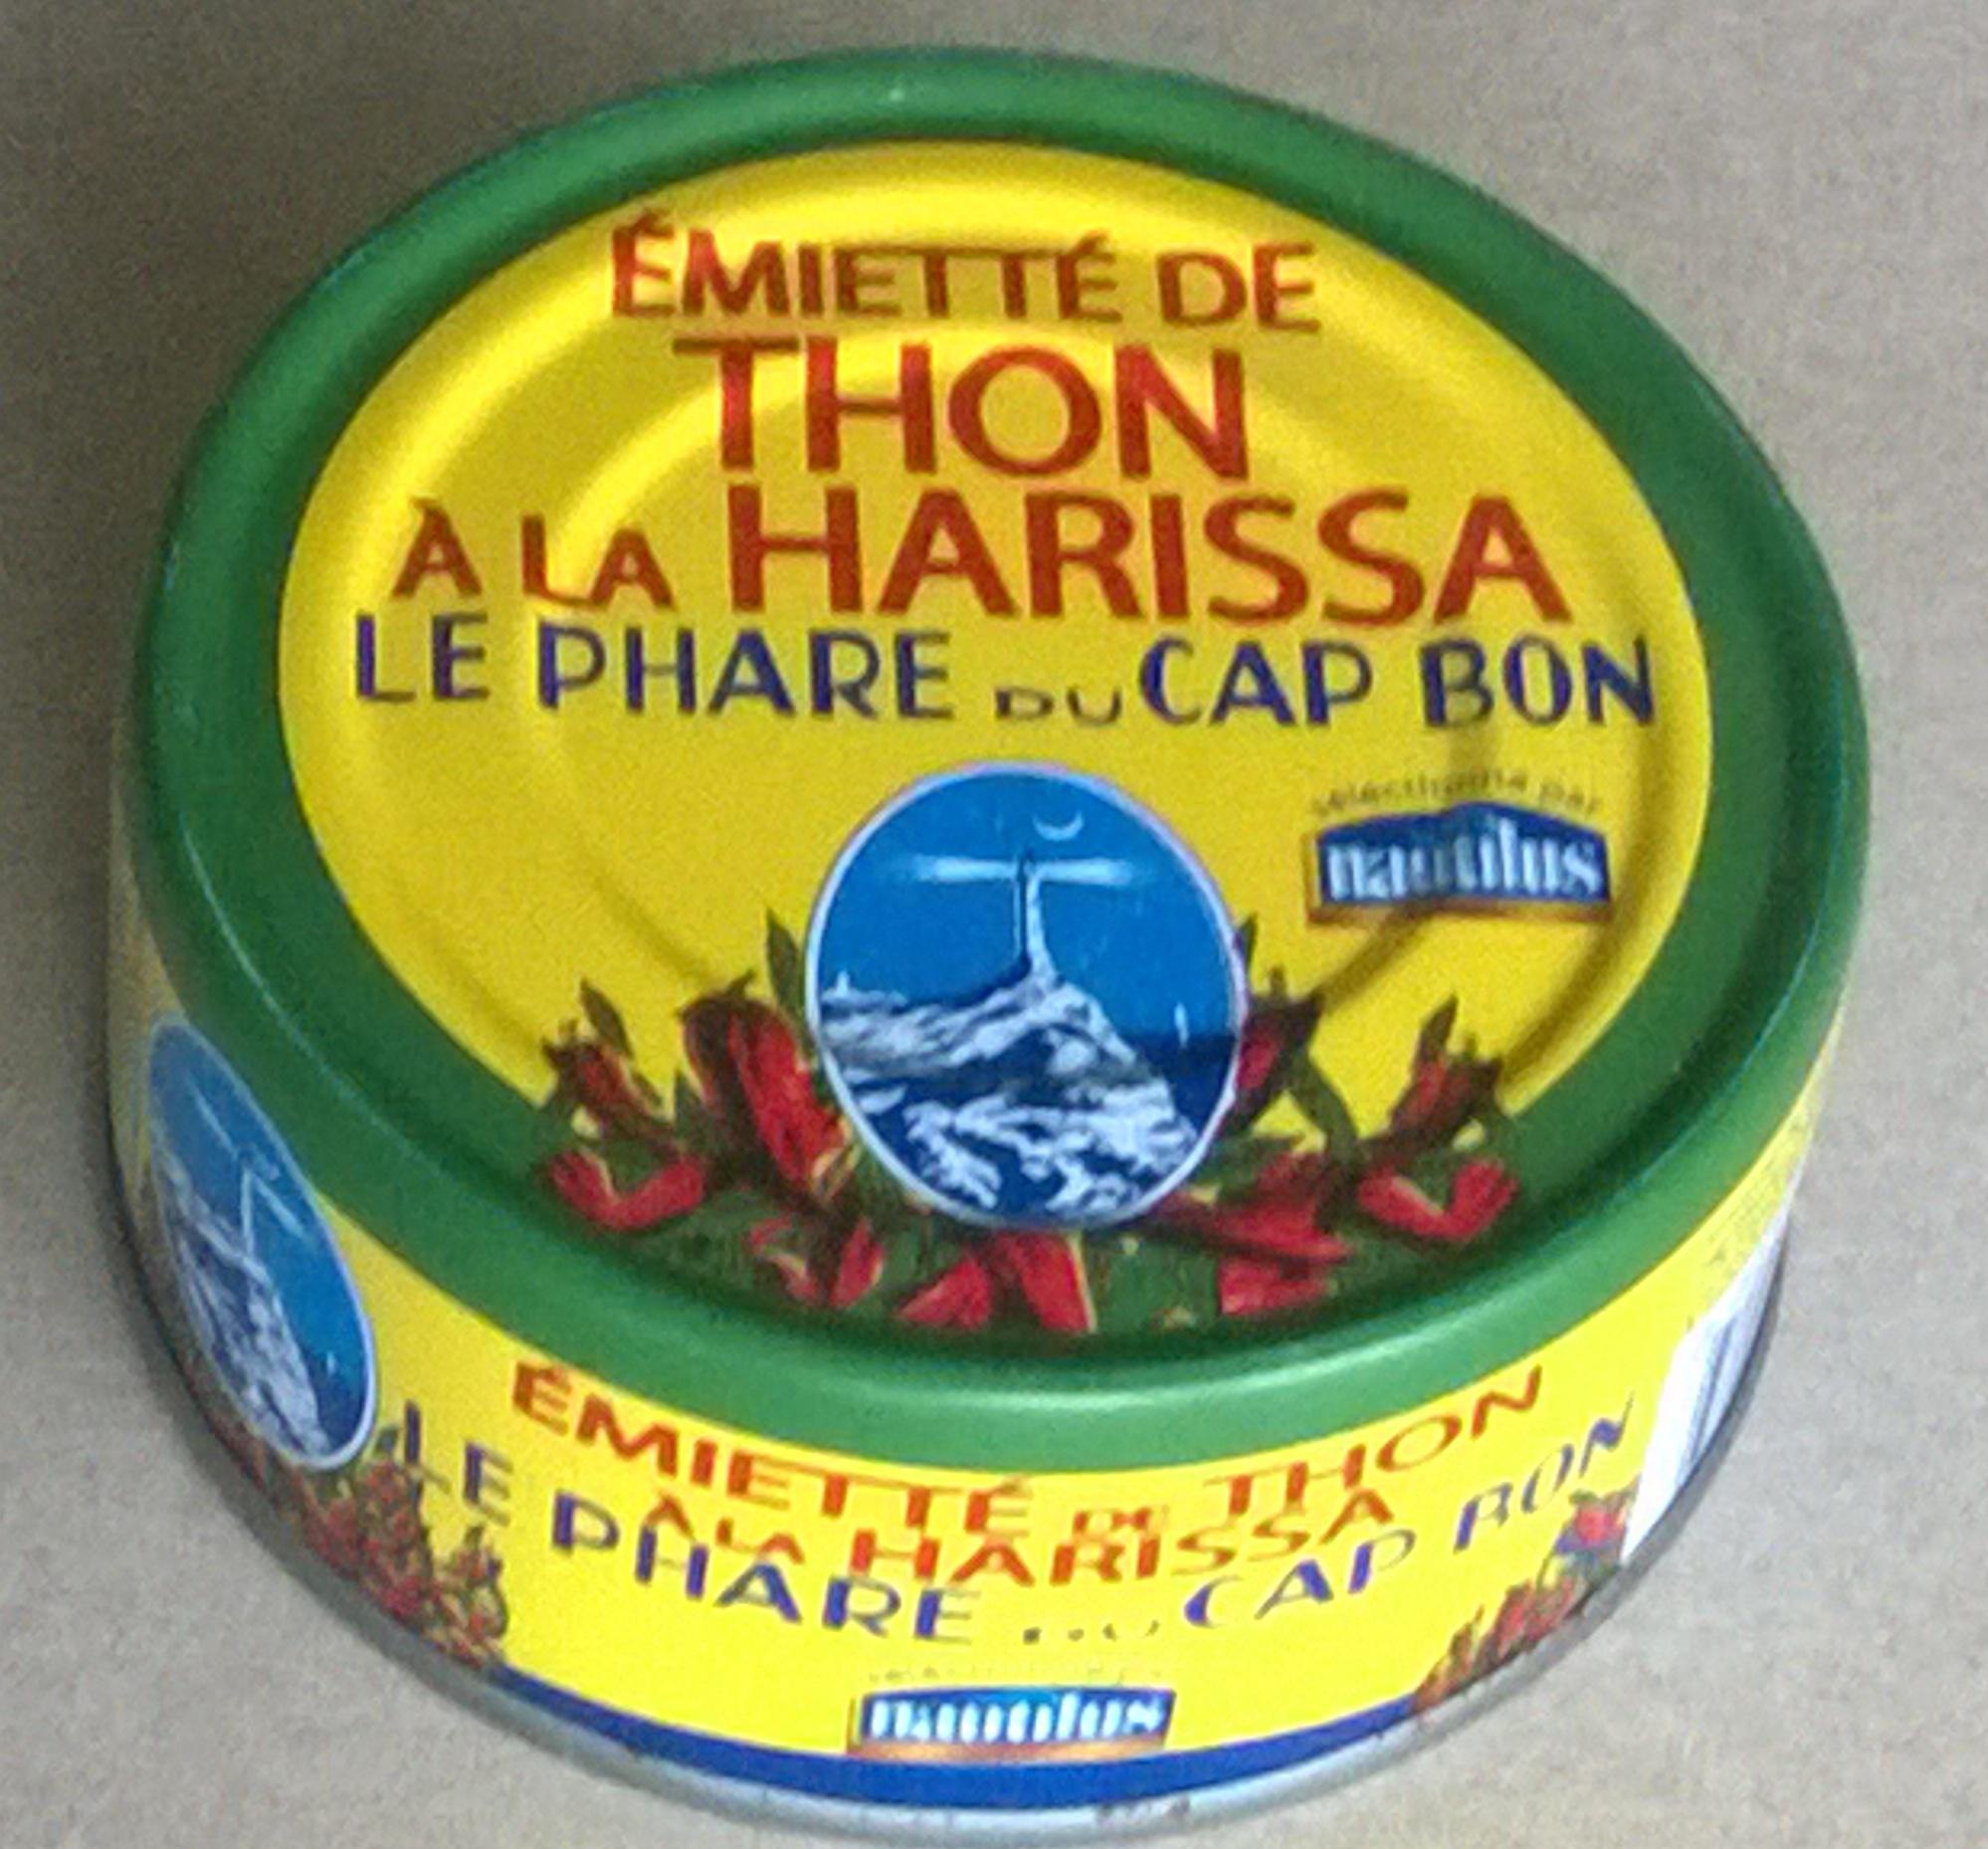 Emiett 233 De Thon 224 La Harissa Le Phare Du Cap Bon 162 G